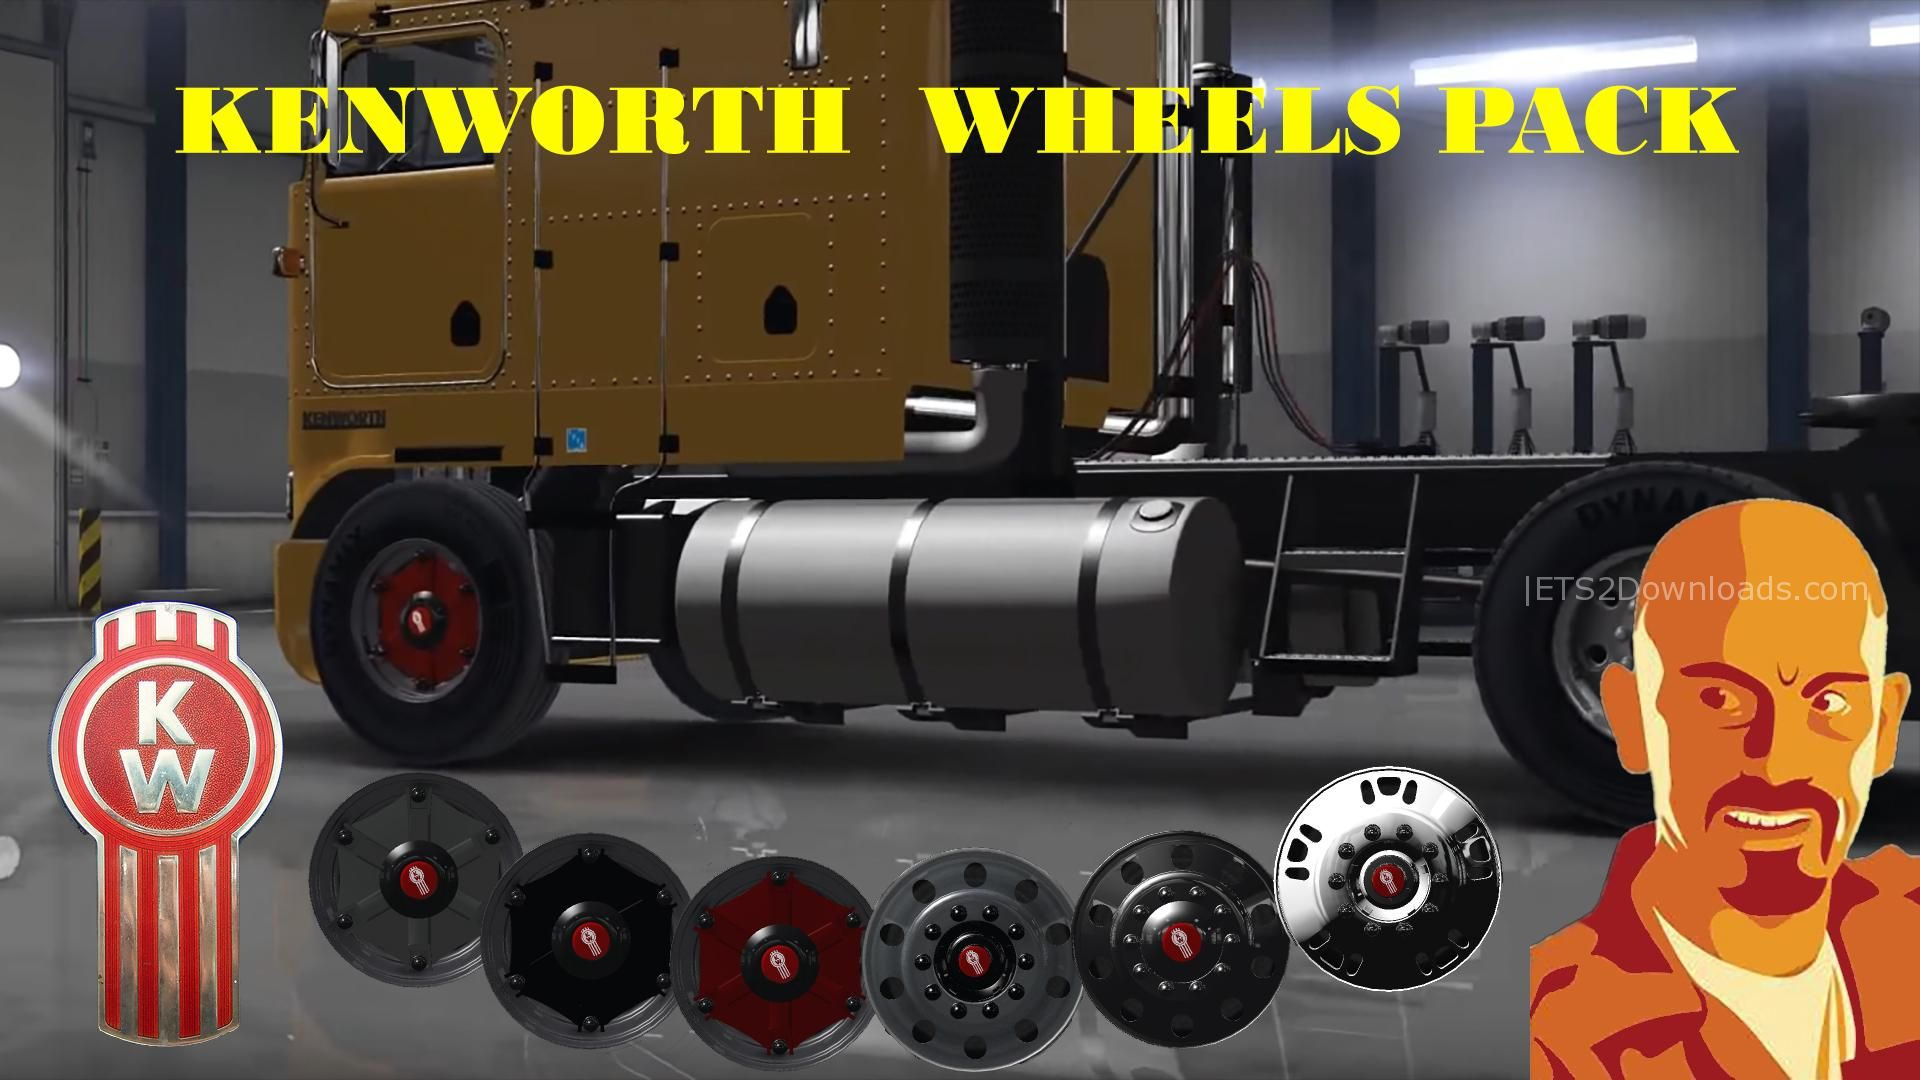 kenworth-wheels-pack-ets2-version-1-26-x-1